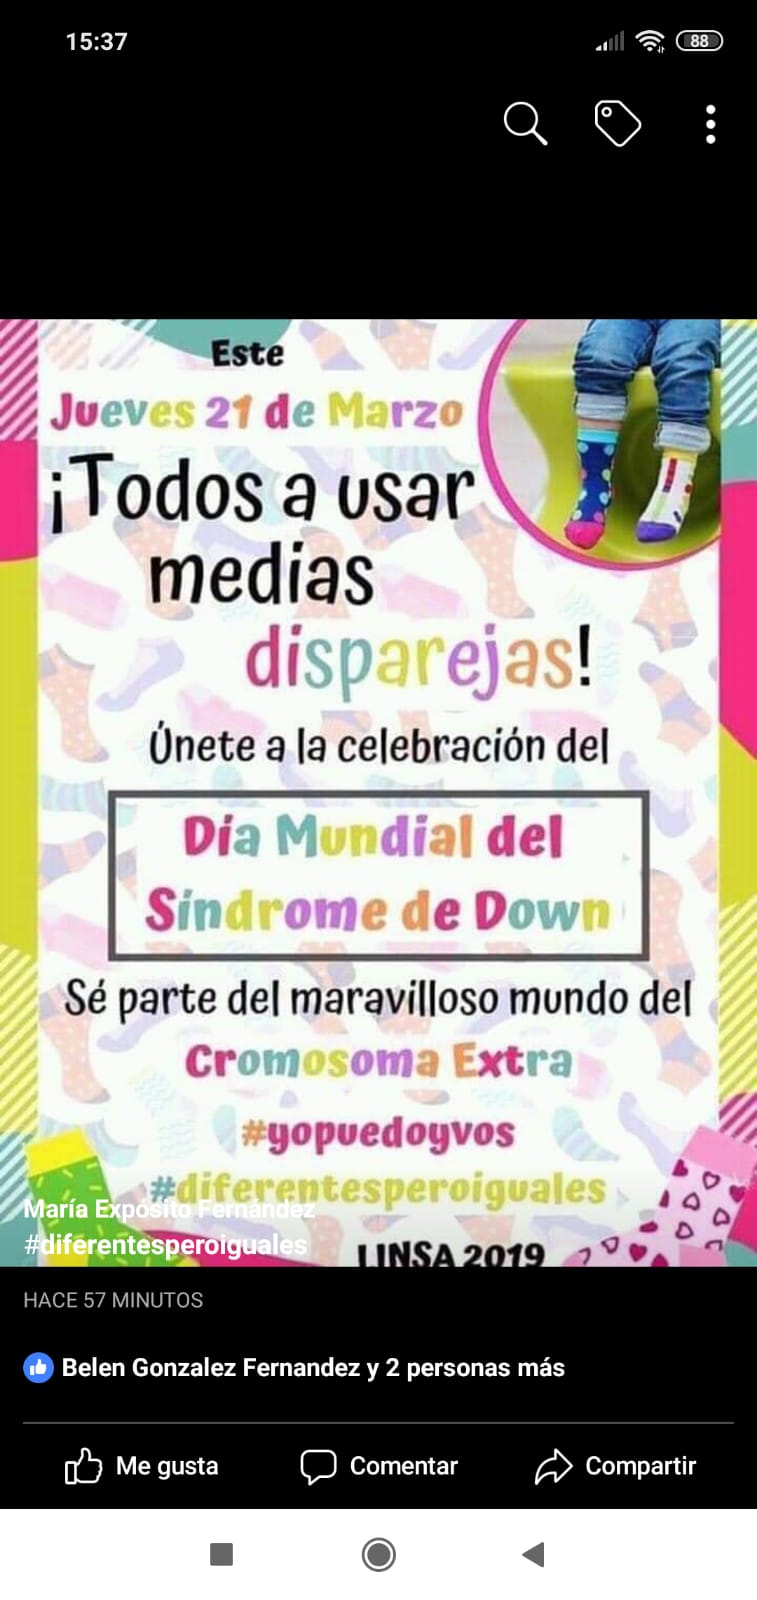 mediasdisparejas4años_19 (2)